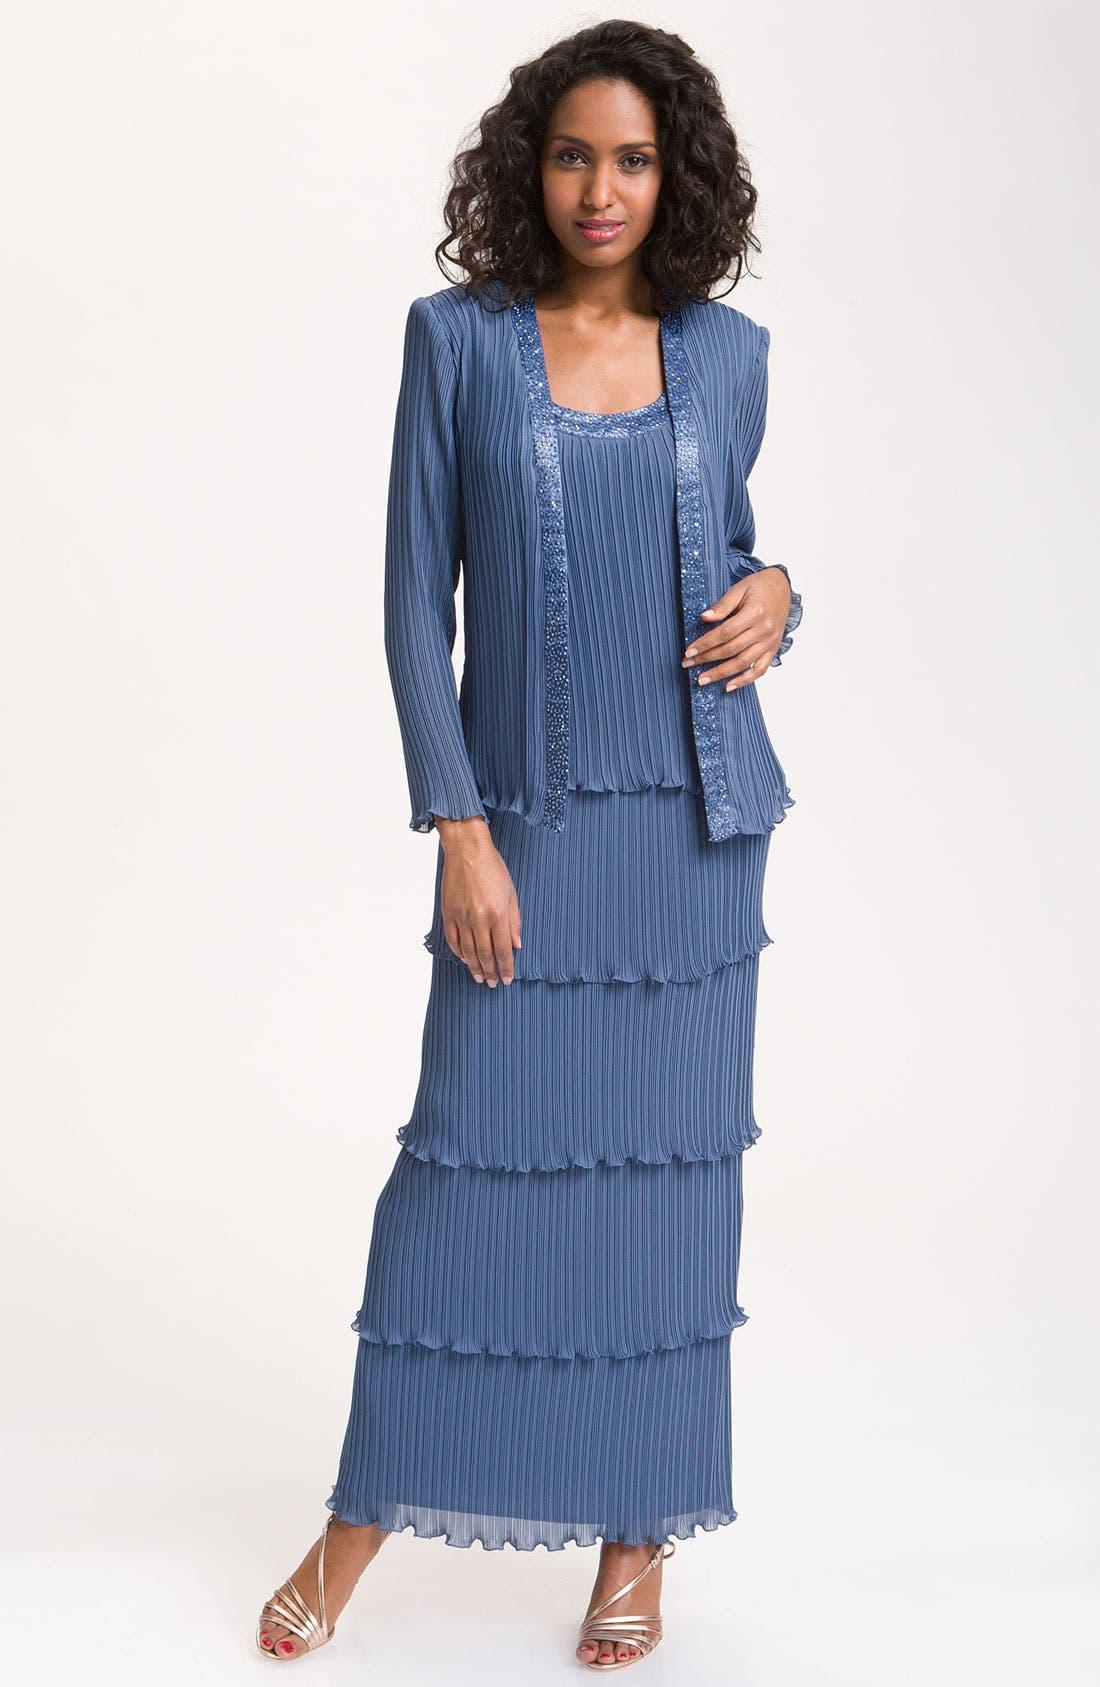 Alternate Image 1 Selected - Patra Beaded Mock Two-Piece Pleated Chiffon Dress